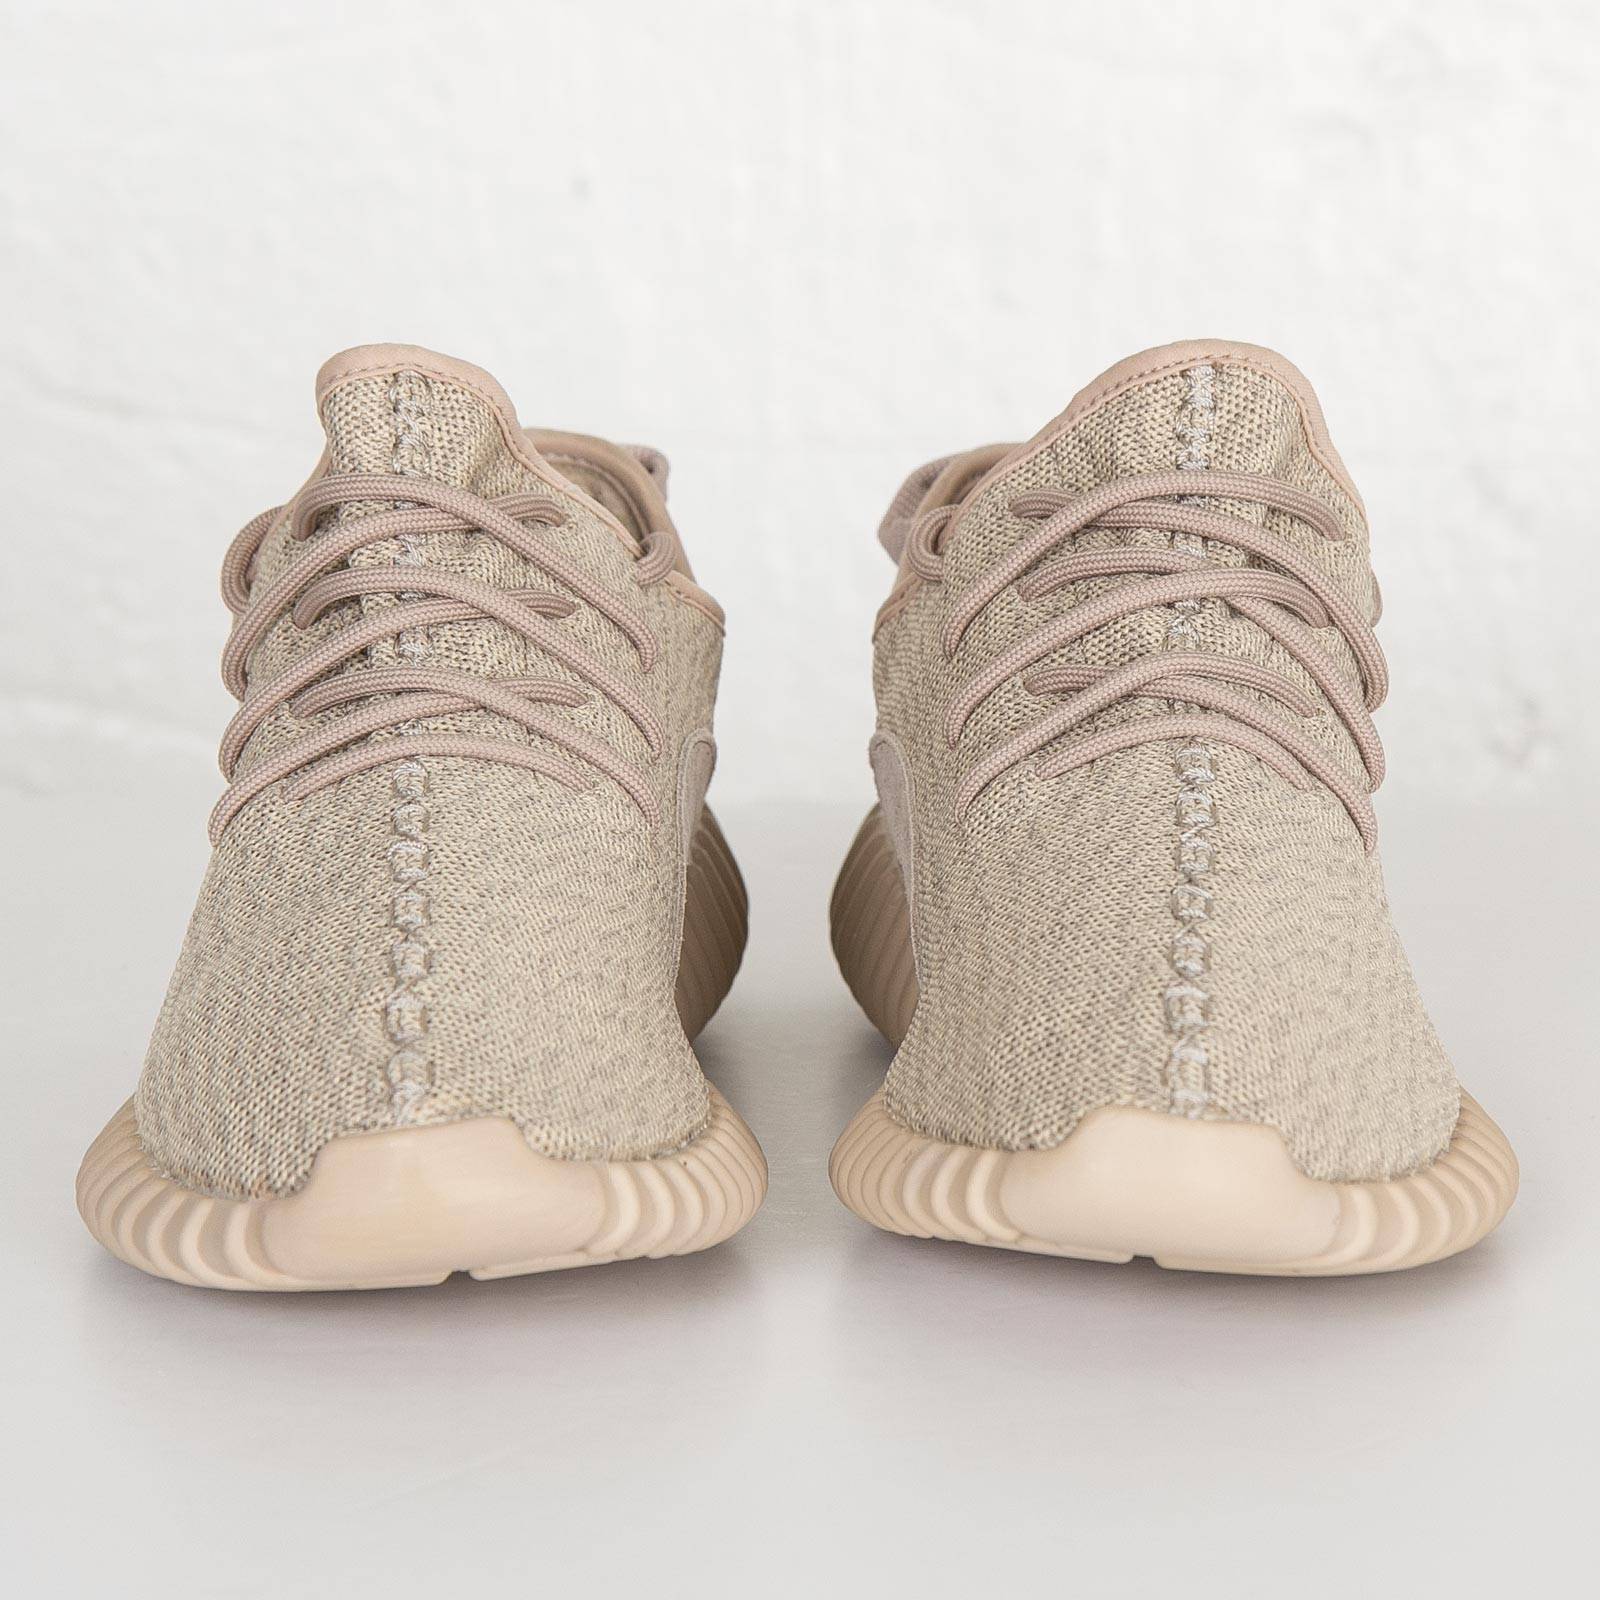 530bb3483 adidas Yeezy Boost 350 - Aq2661 - Sneakersnstuff